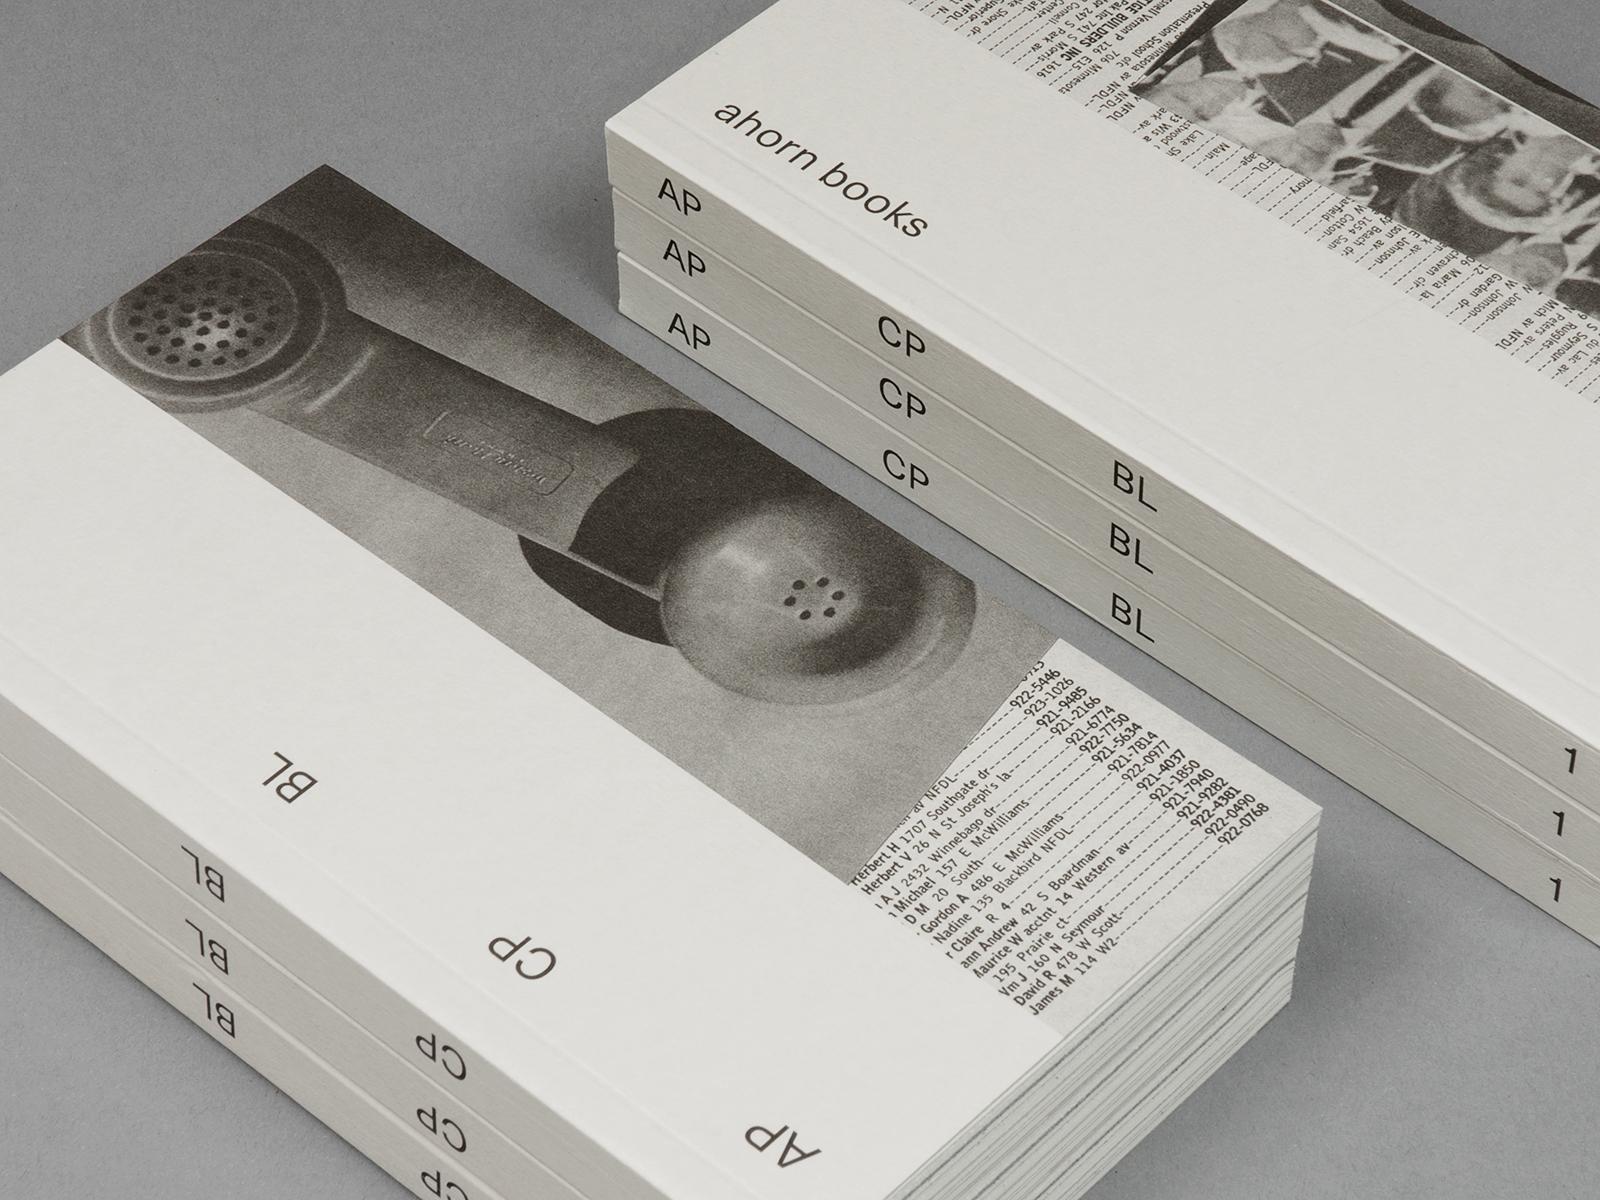 Anya Jasbar, Ahorn Books